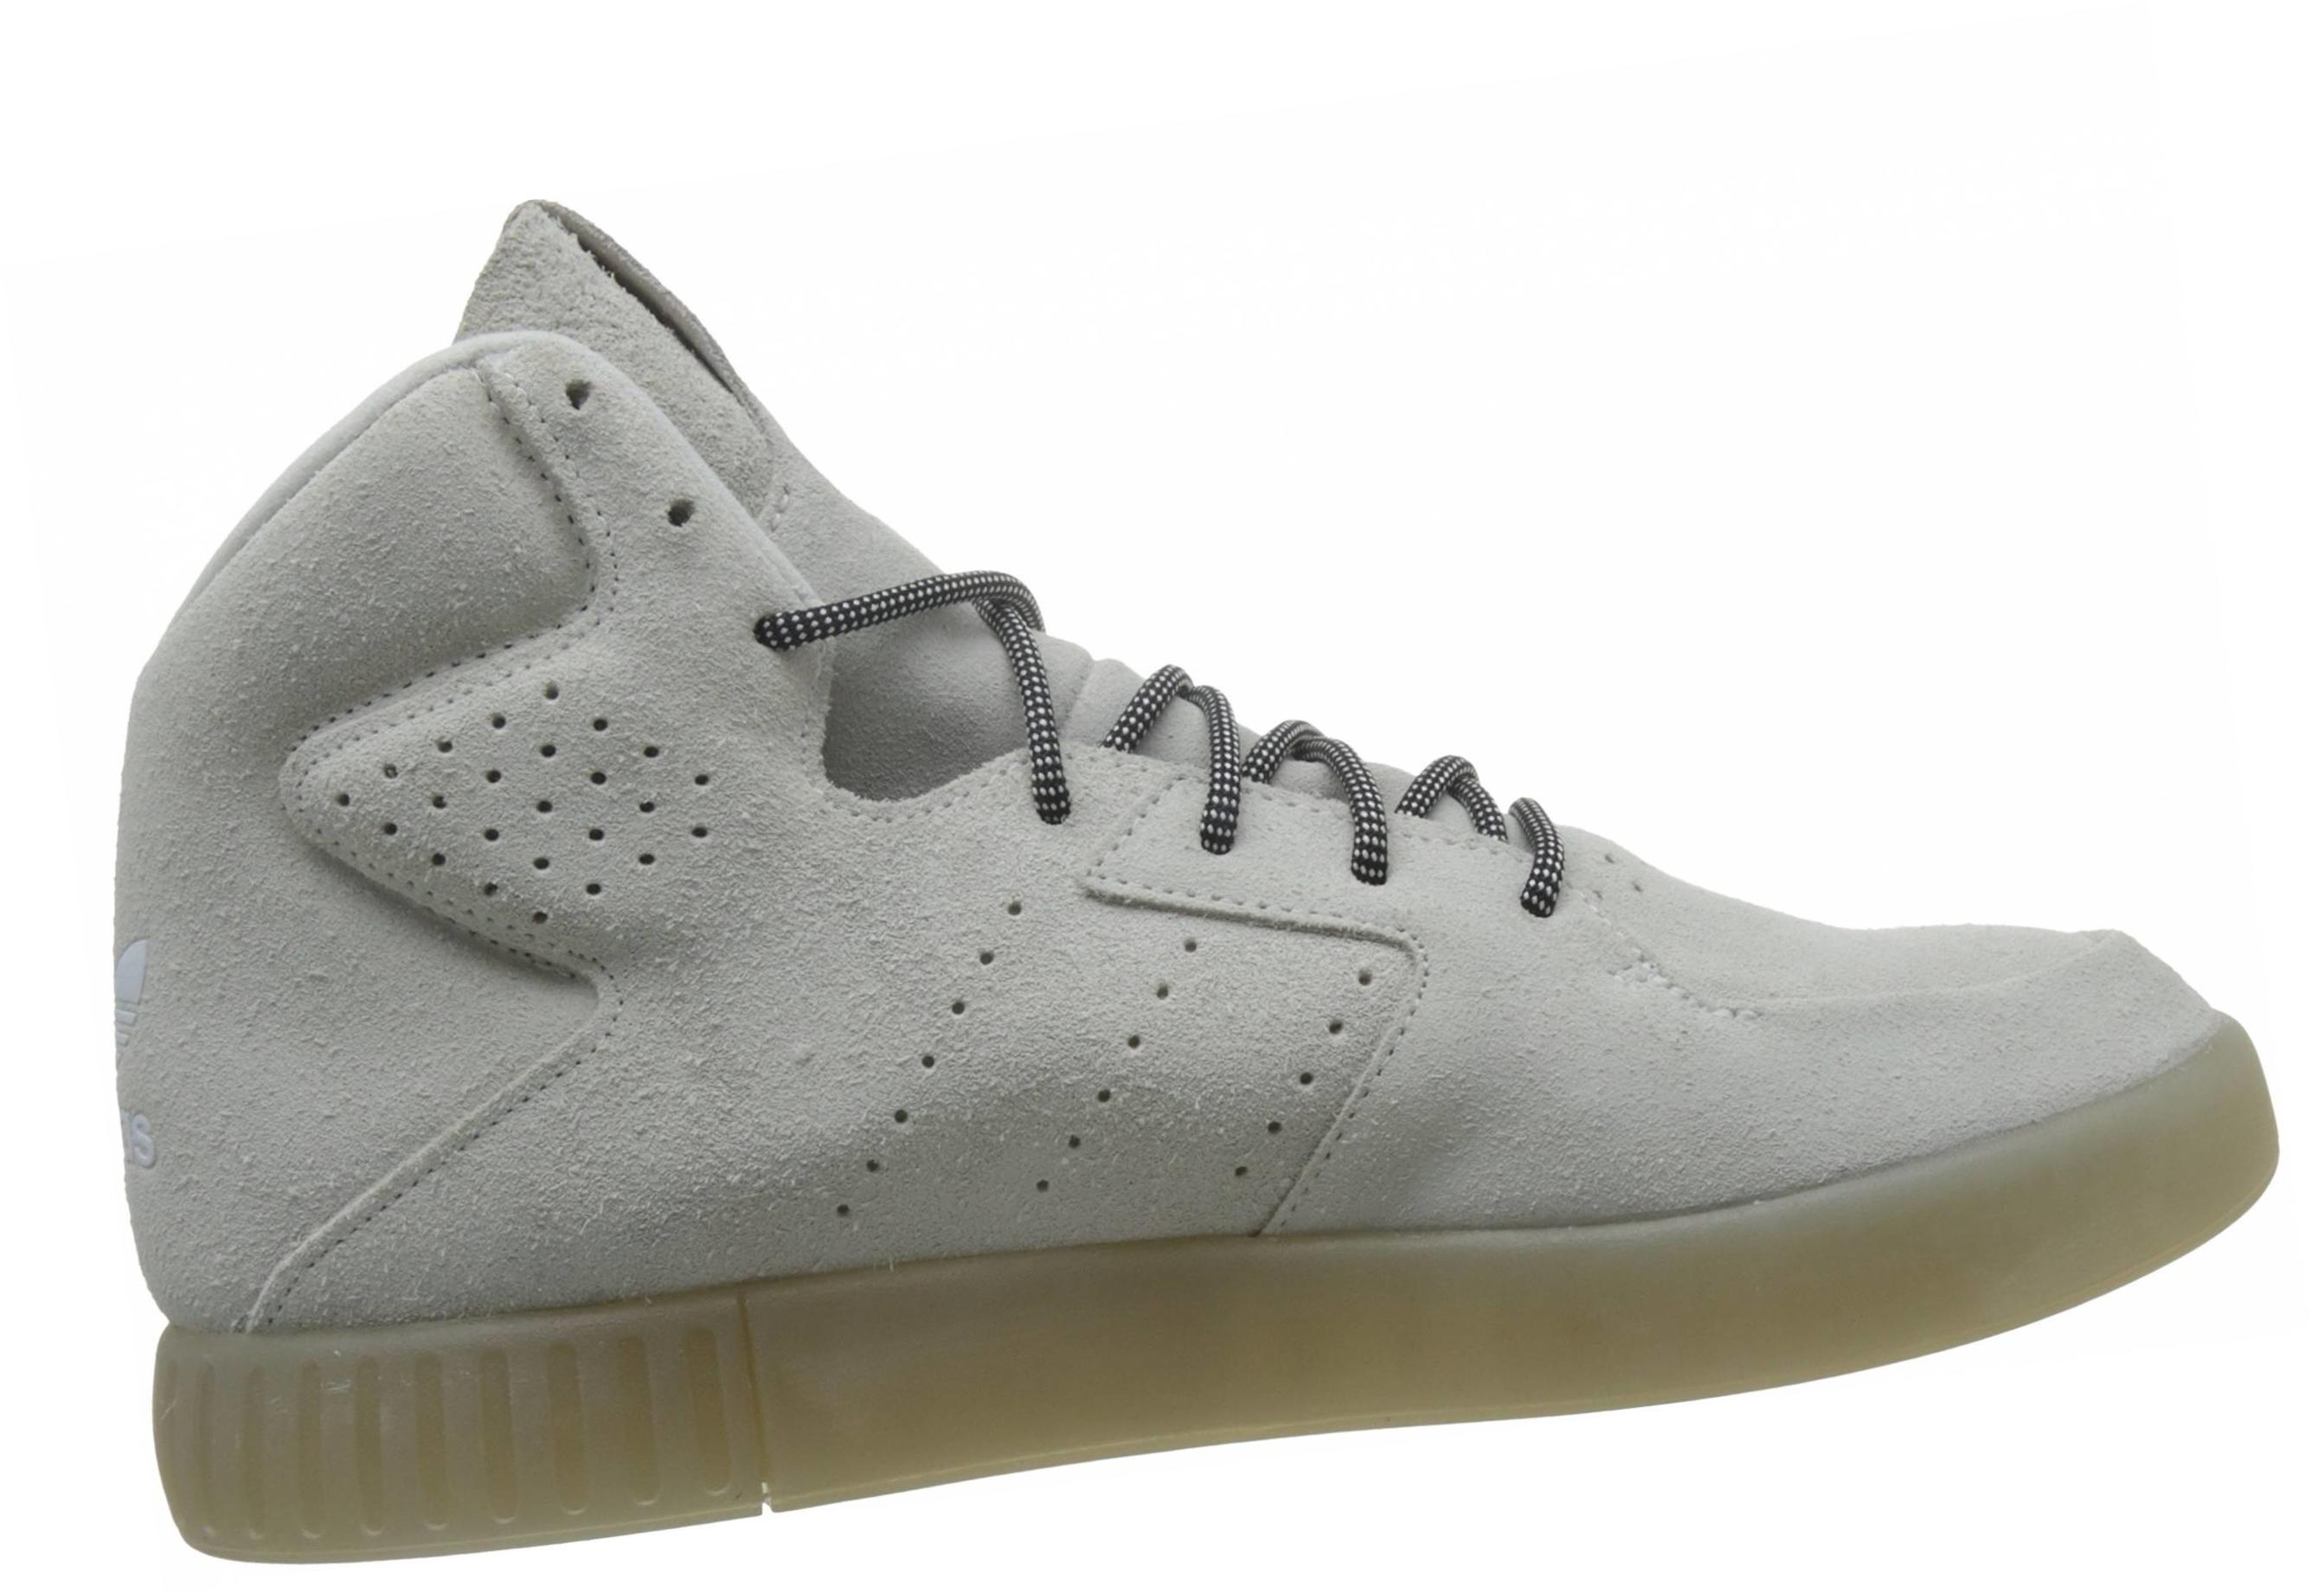 cute outlet exclusive shoes 7 плюсов и 5 минусов Adidas Tubular Invader 2.0